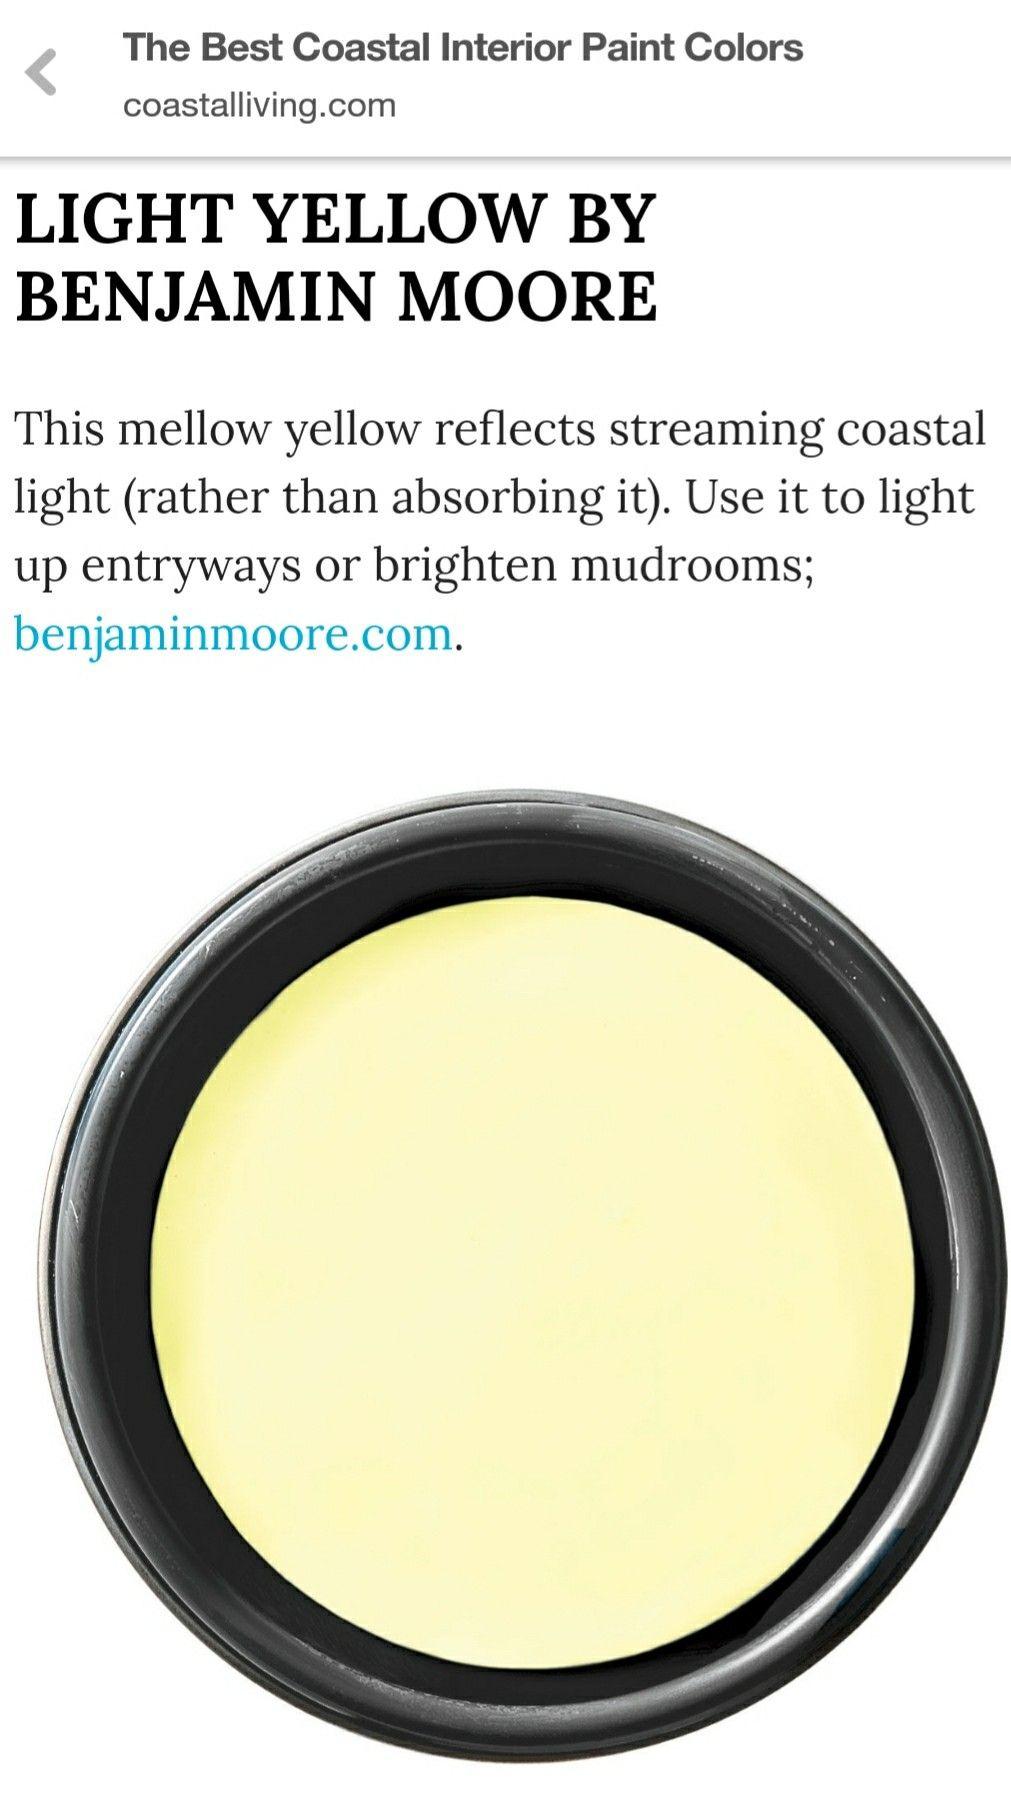 benjamin moore light yellow coastal interiors paint on lake cottage interior paint colors id=91460